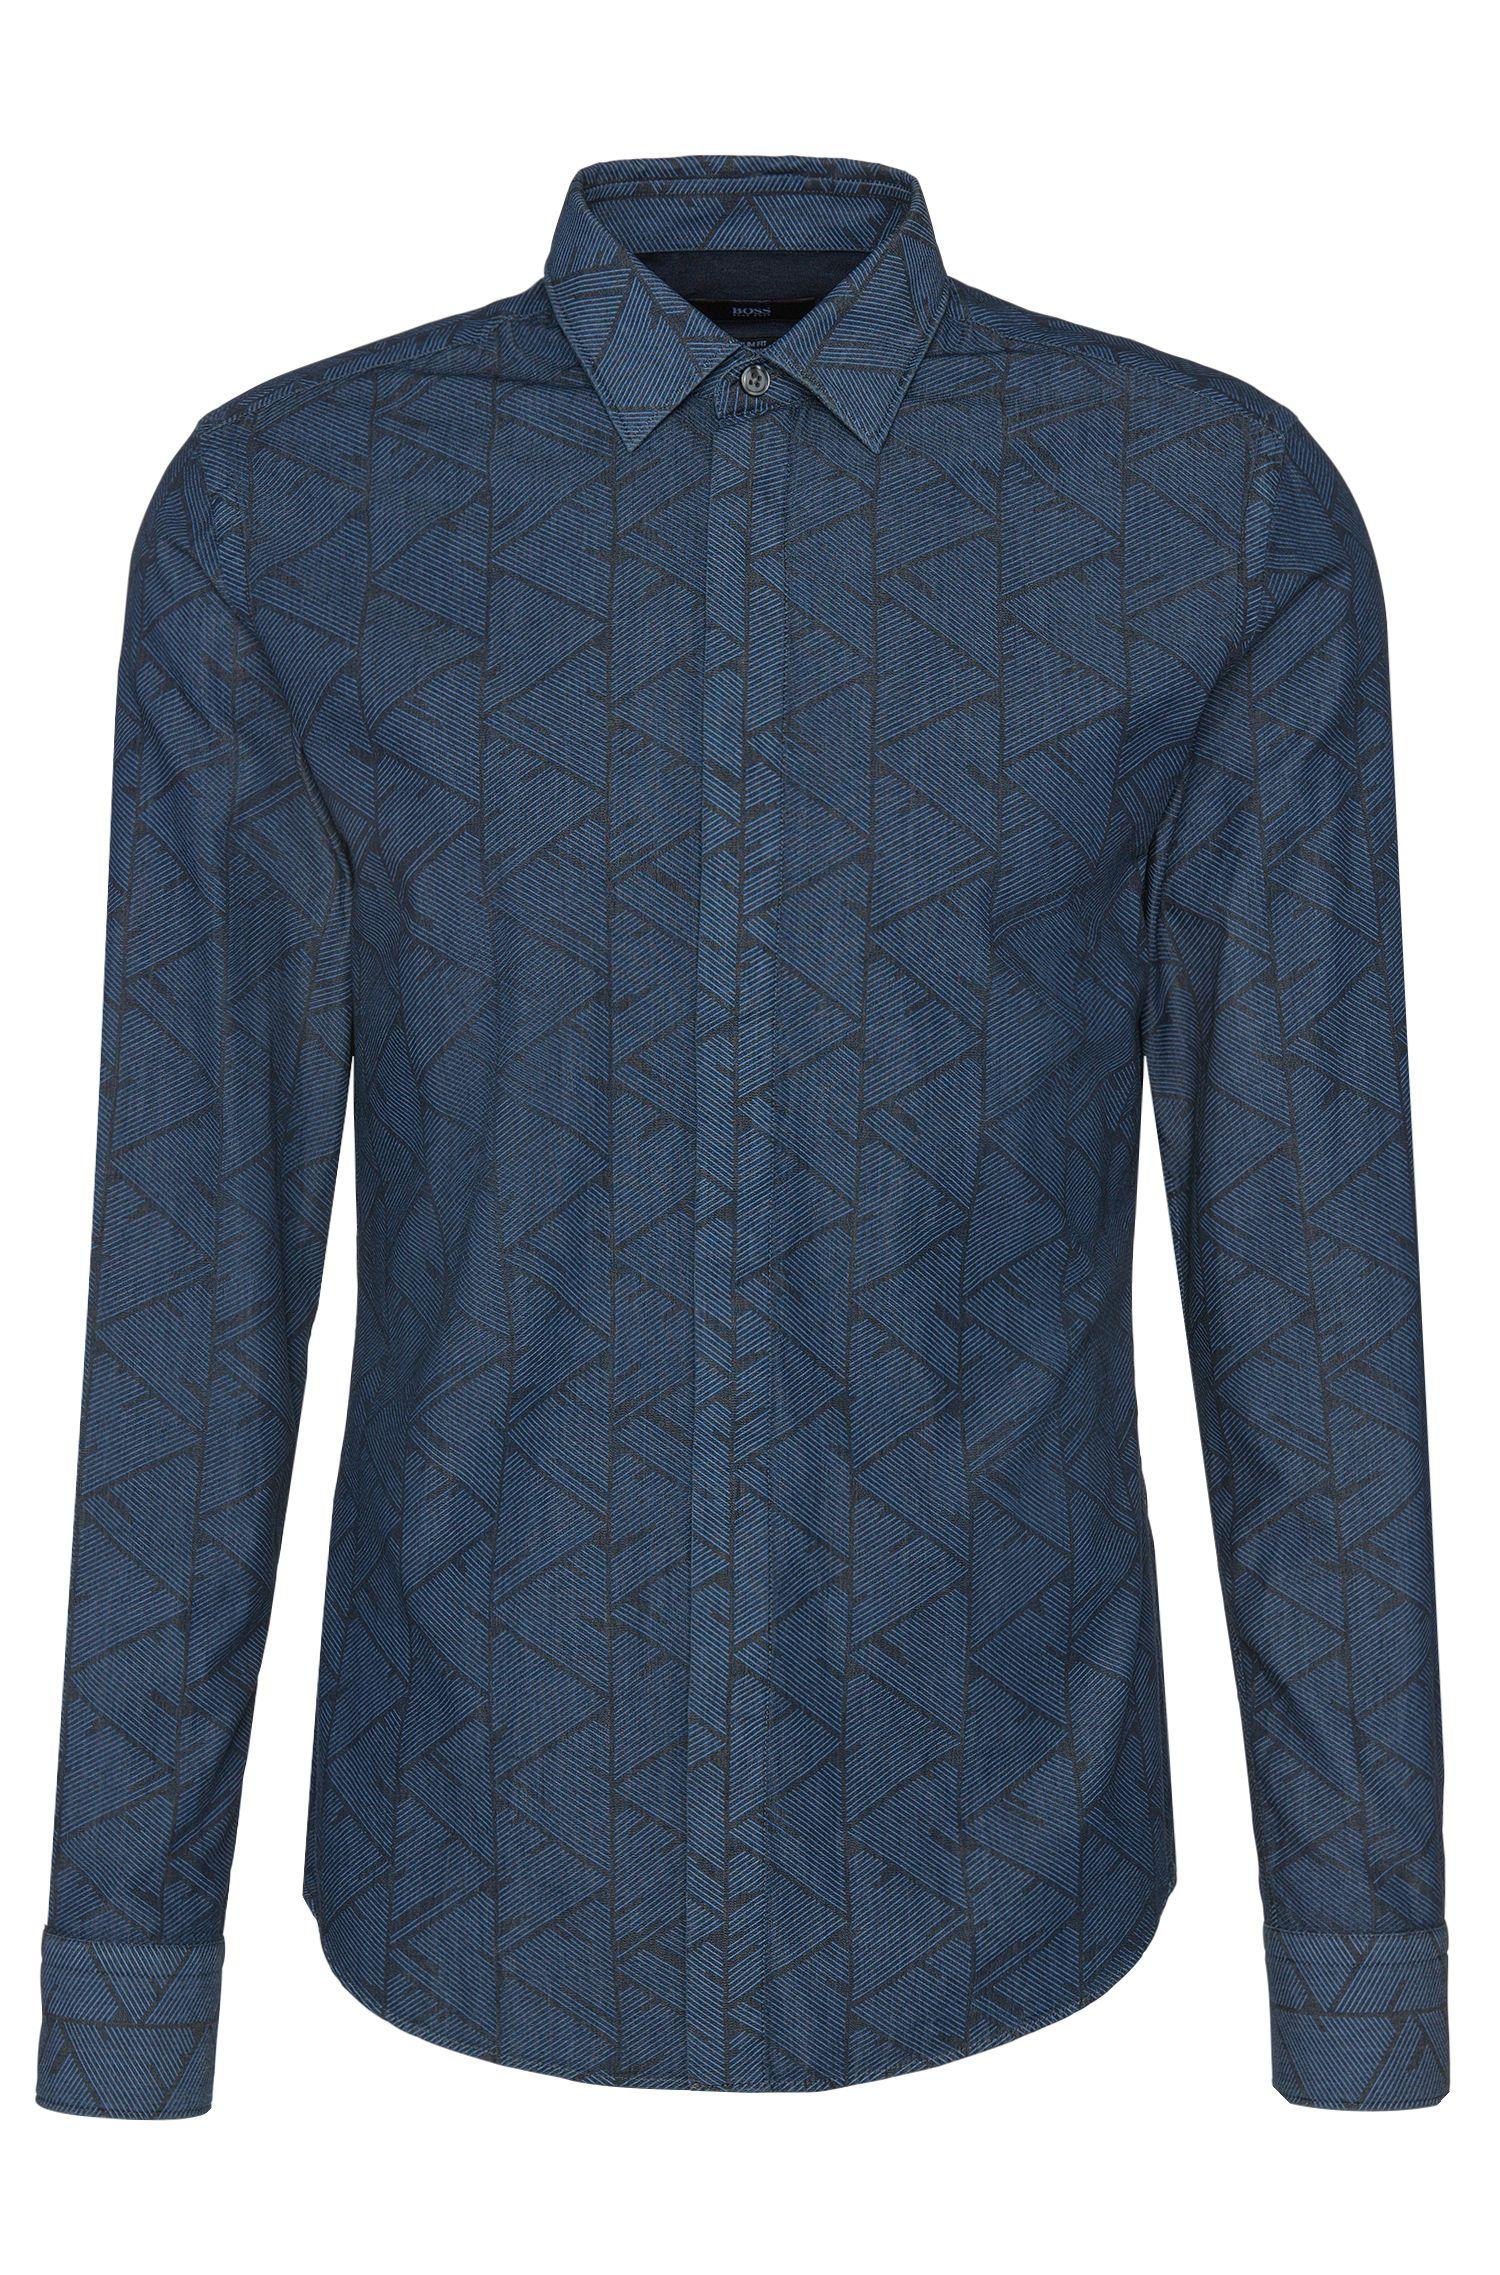 'Reid' | Slim Fit, Italian Cotton Abstract Button Down Shirt